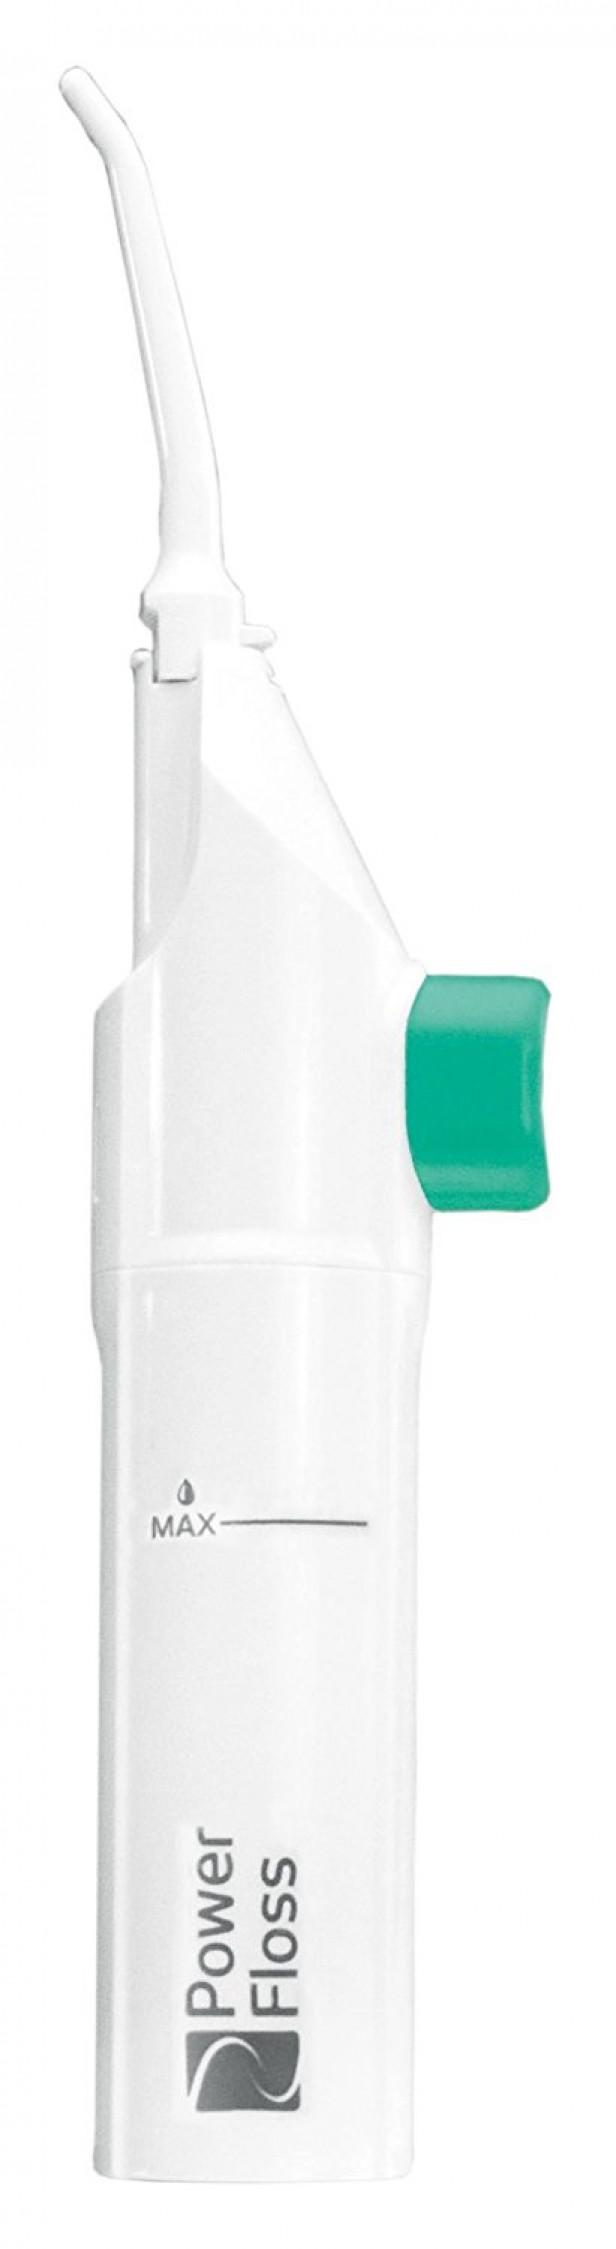 oral irrigator dental water jet power floss air powered flosser teeth cleaner. Black Bedroom Furniture Sets. Home Design Ideas